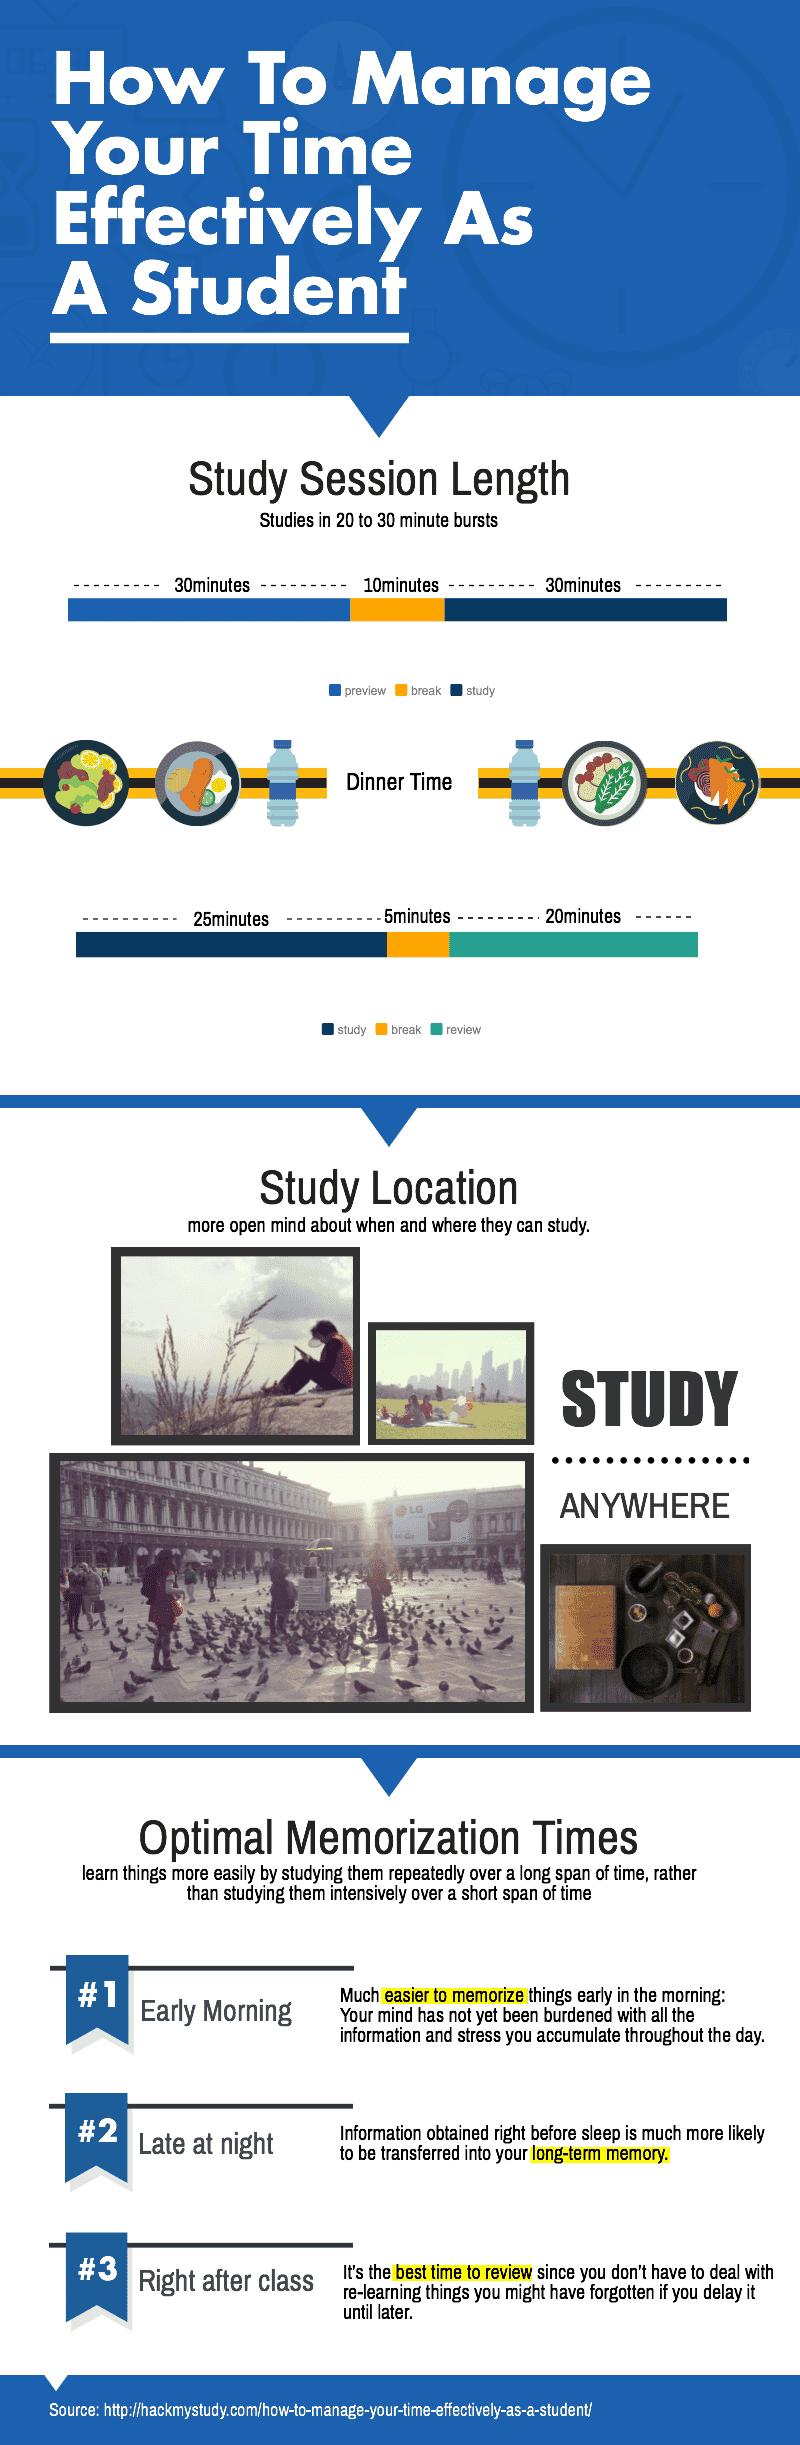 piktochart-infographic_student-time-management-9566449